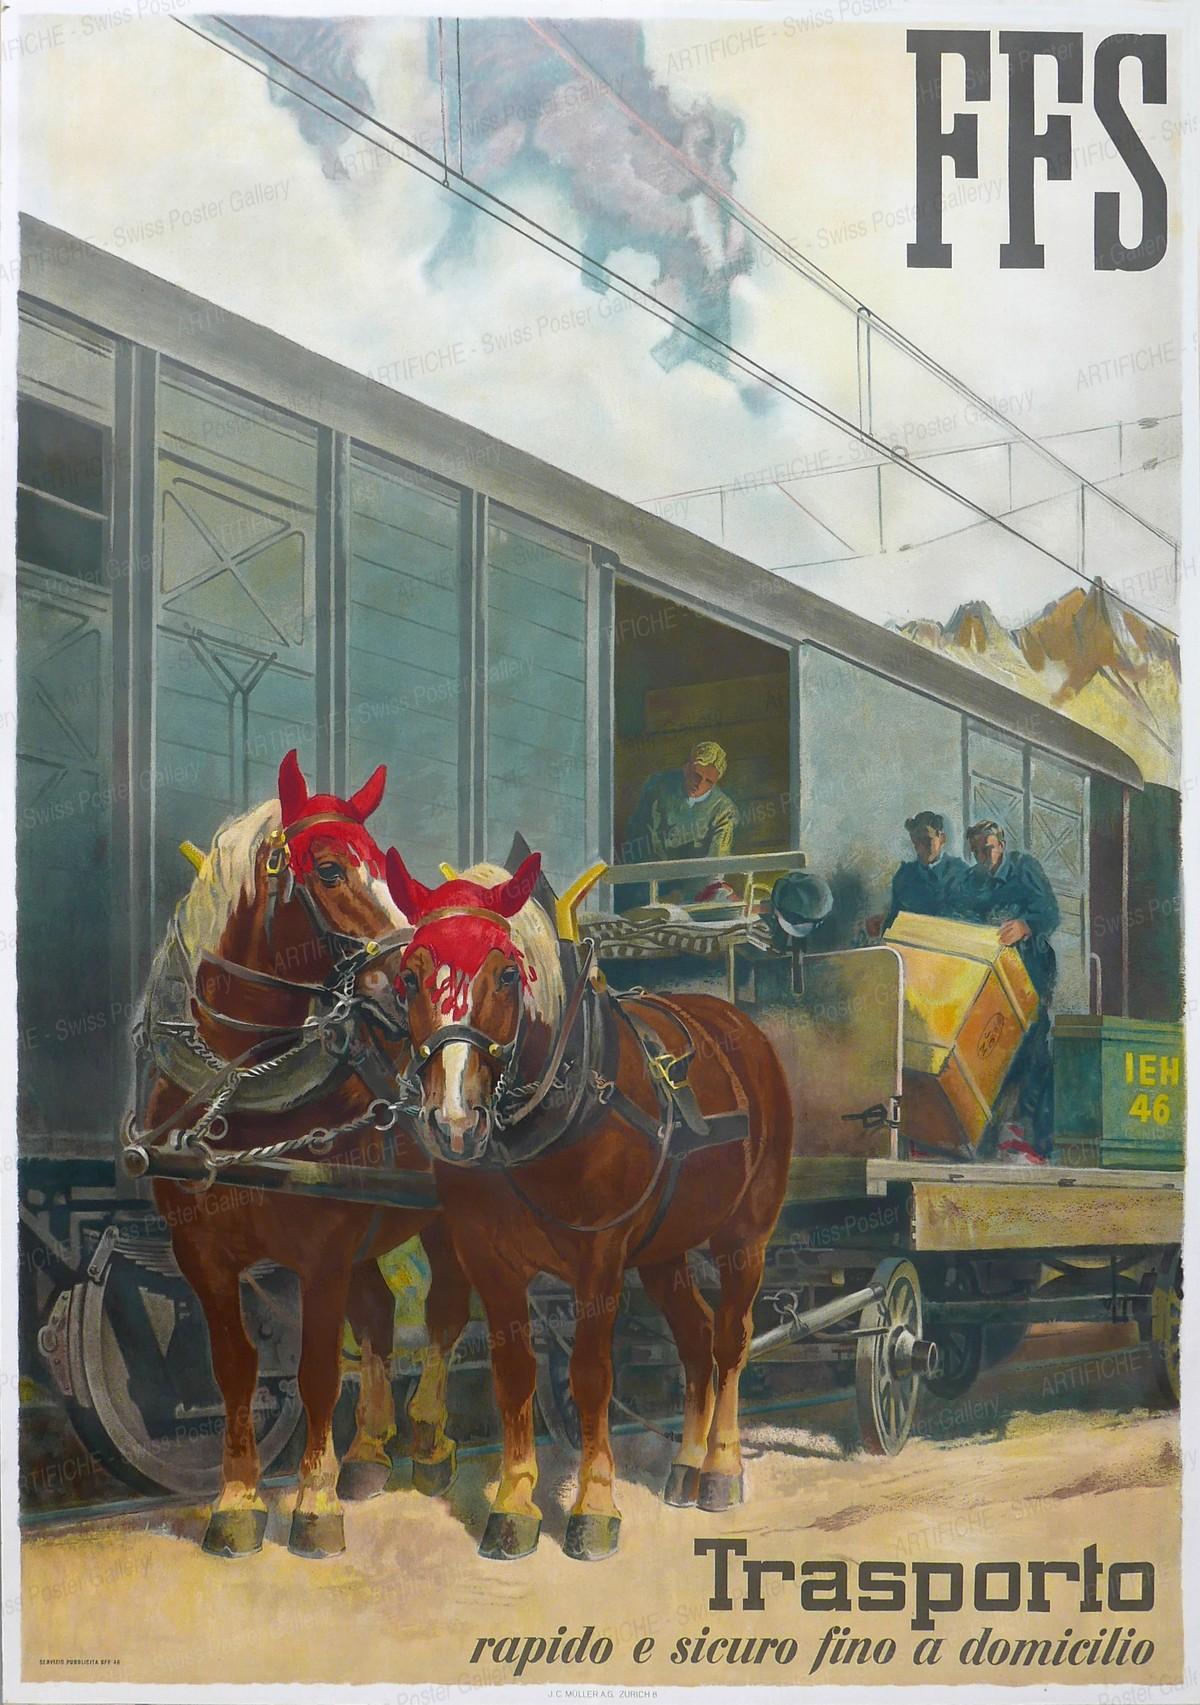 CFF – Transports rapides et sûrs au domicile, Iwan Edwin Hugentobler